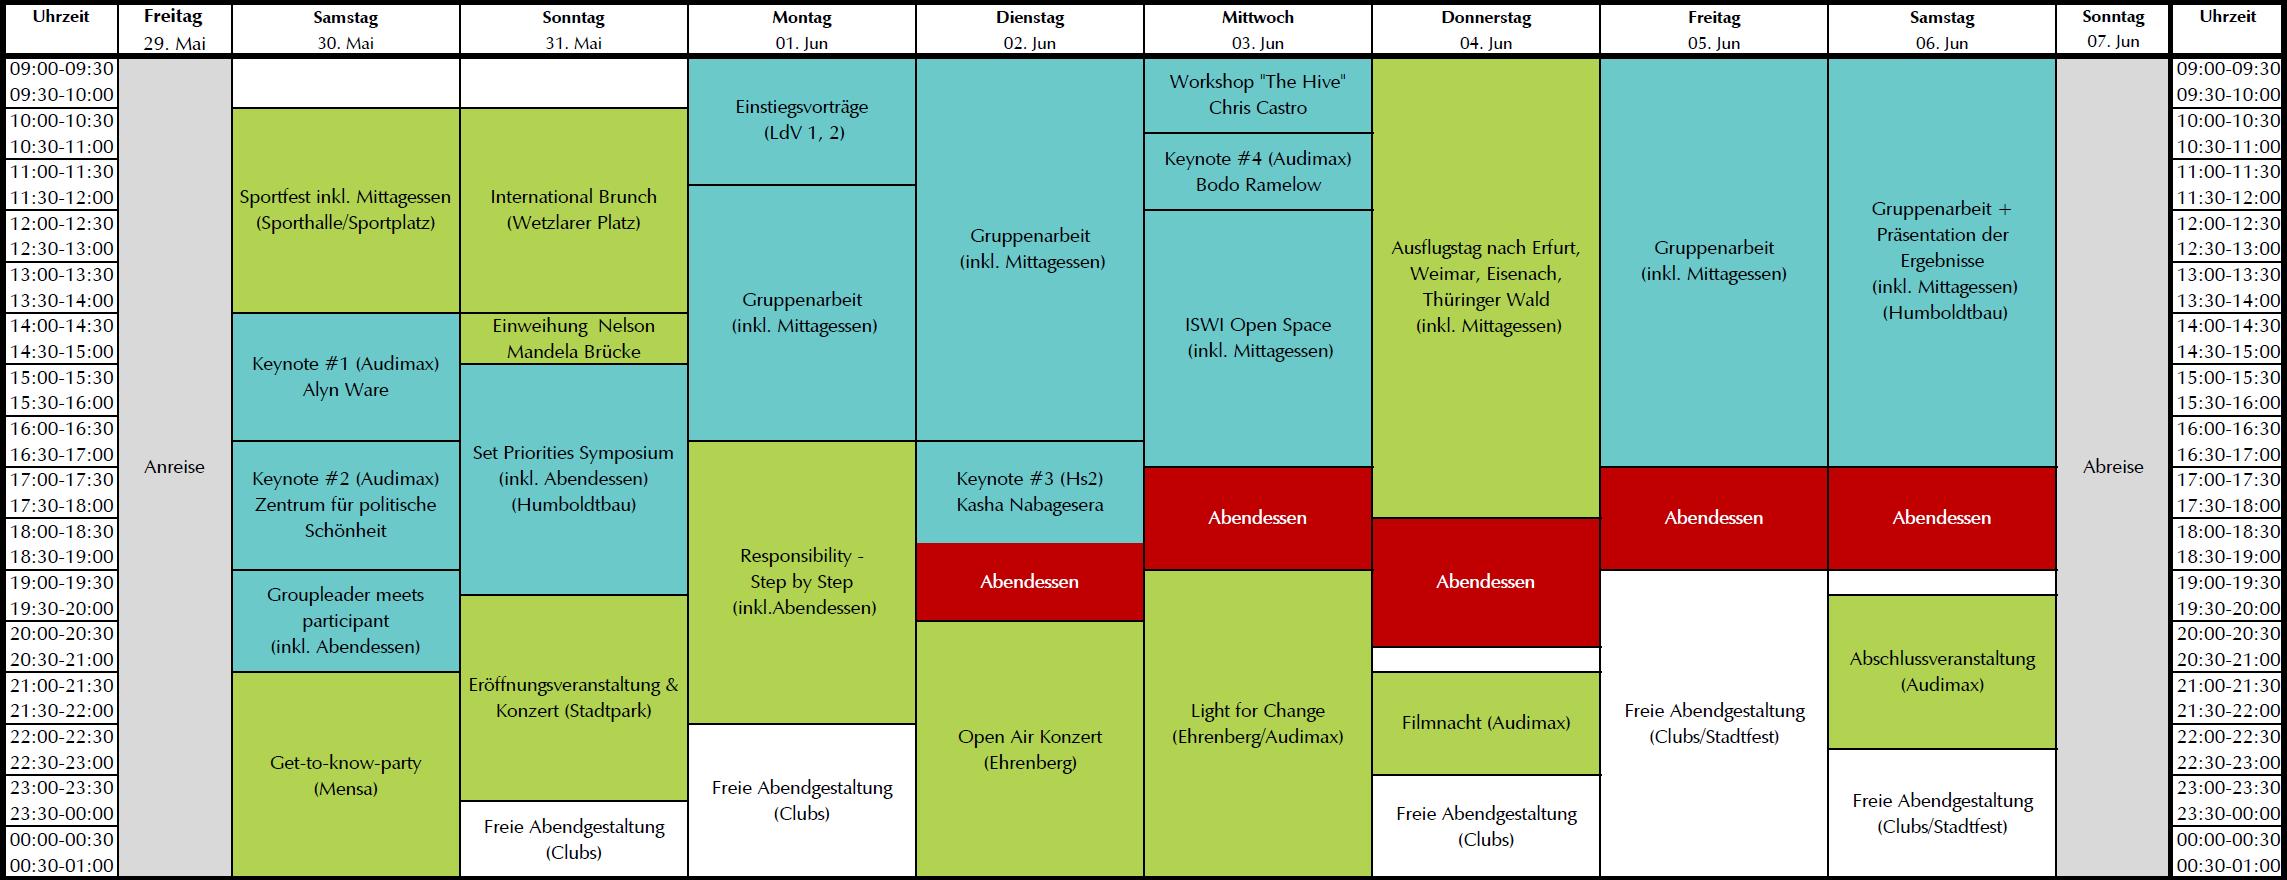 Zeitplan der ISWI 2015 (Mai 2015)